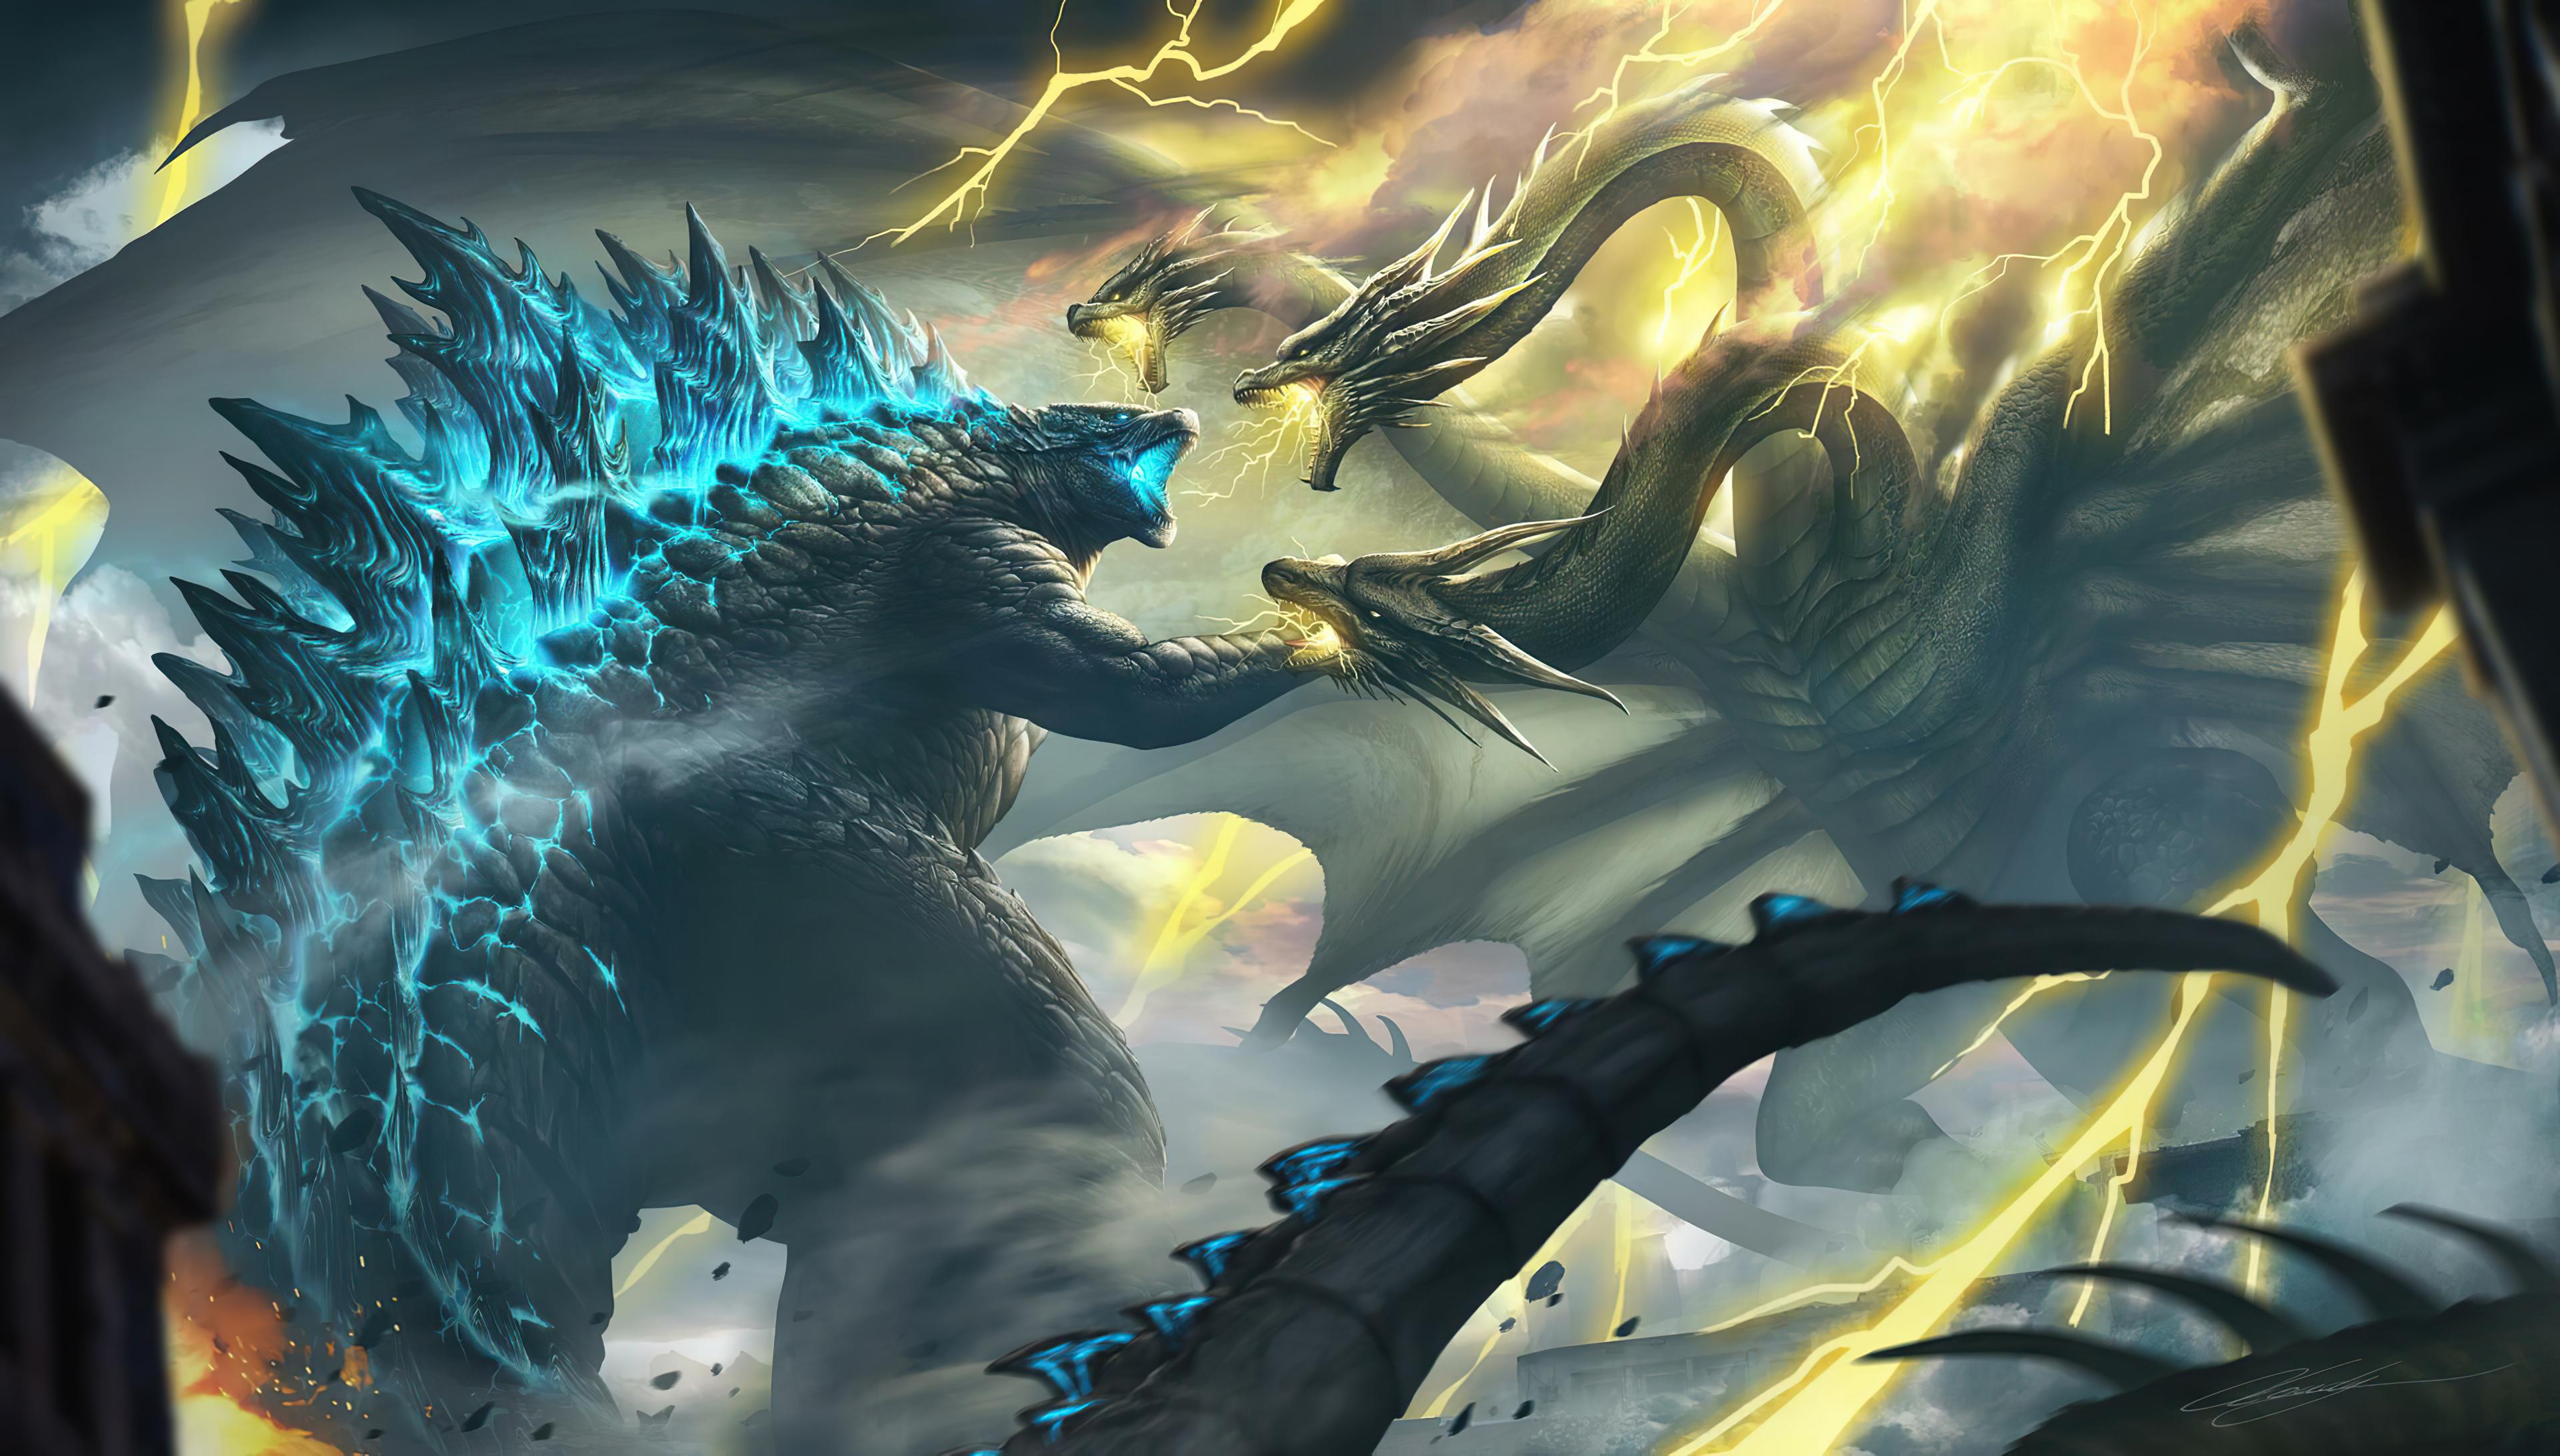 Ghidorah Godzilla King Of The Monsters 4k, HD Movies, 4k ...